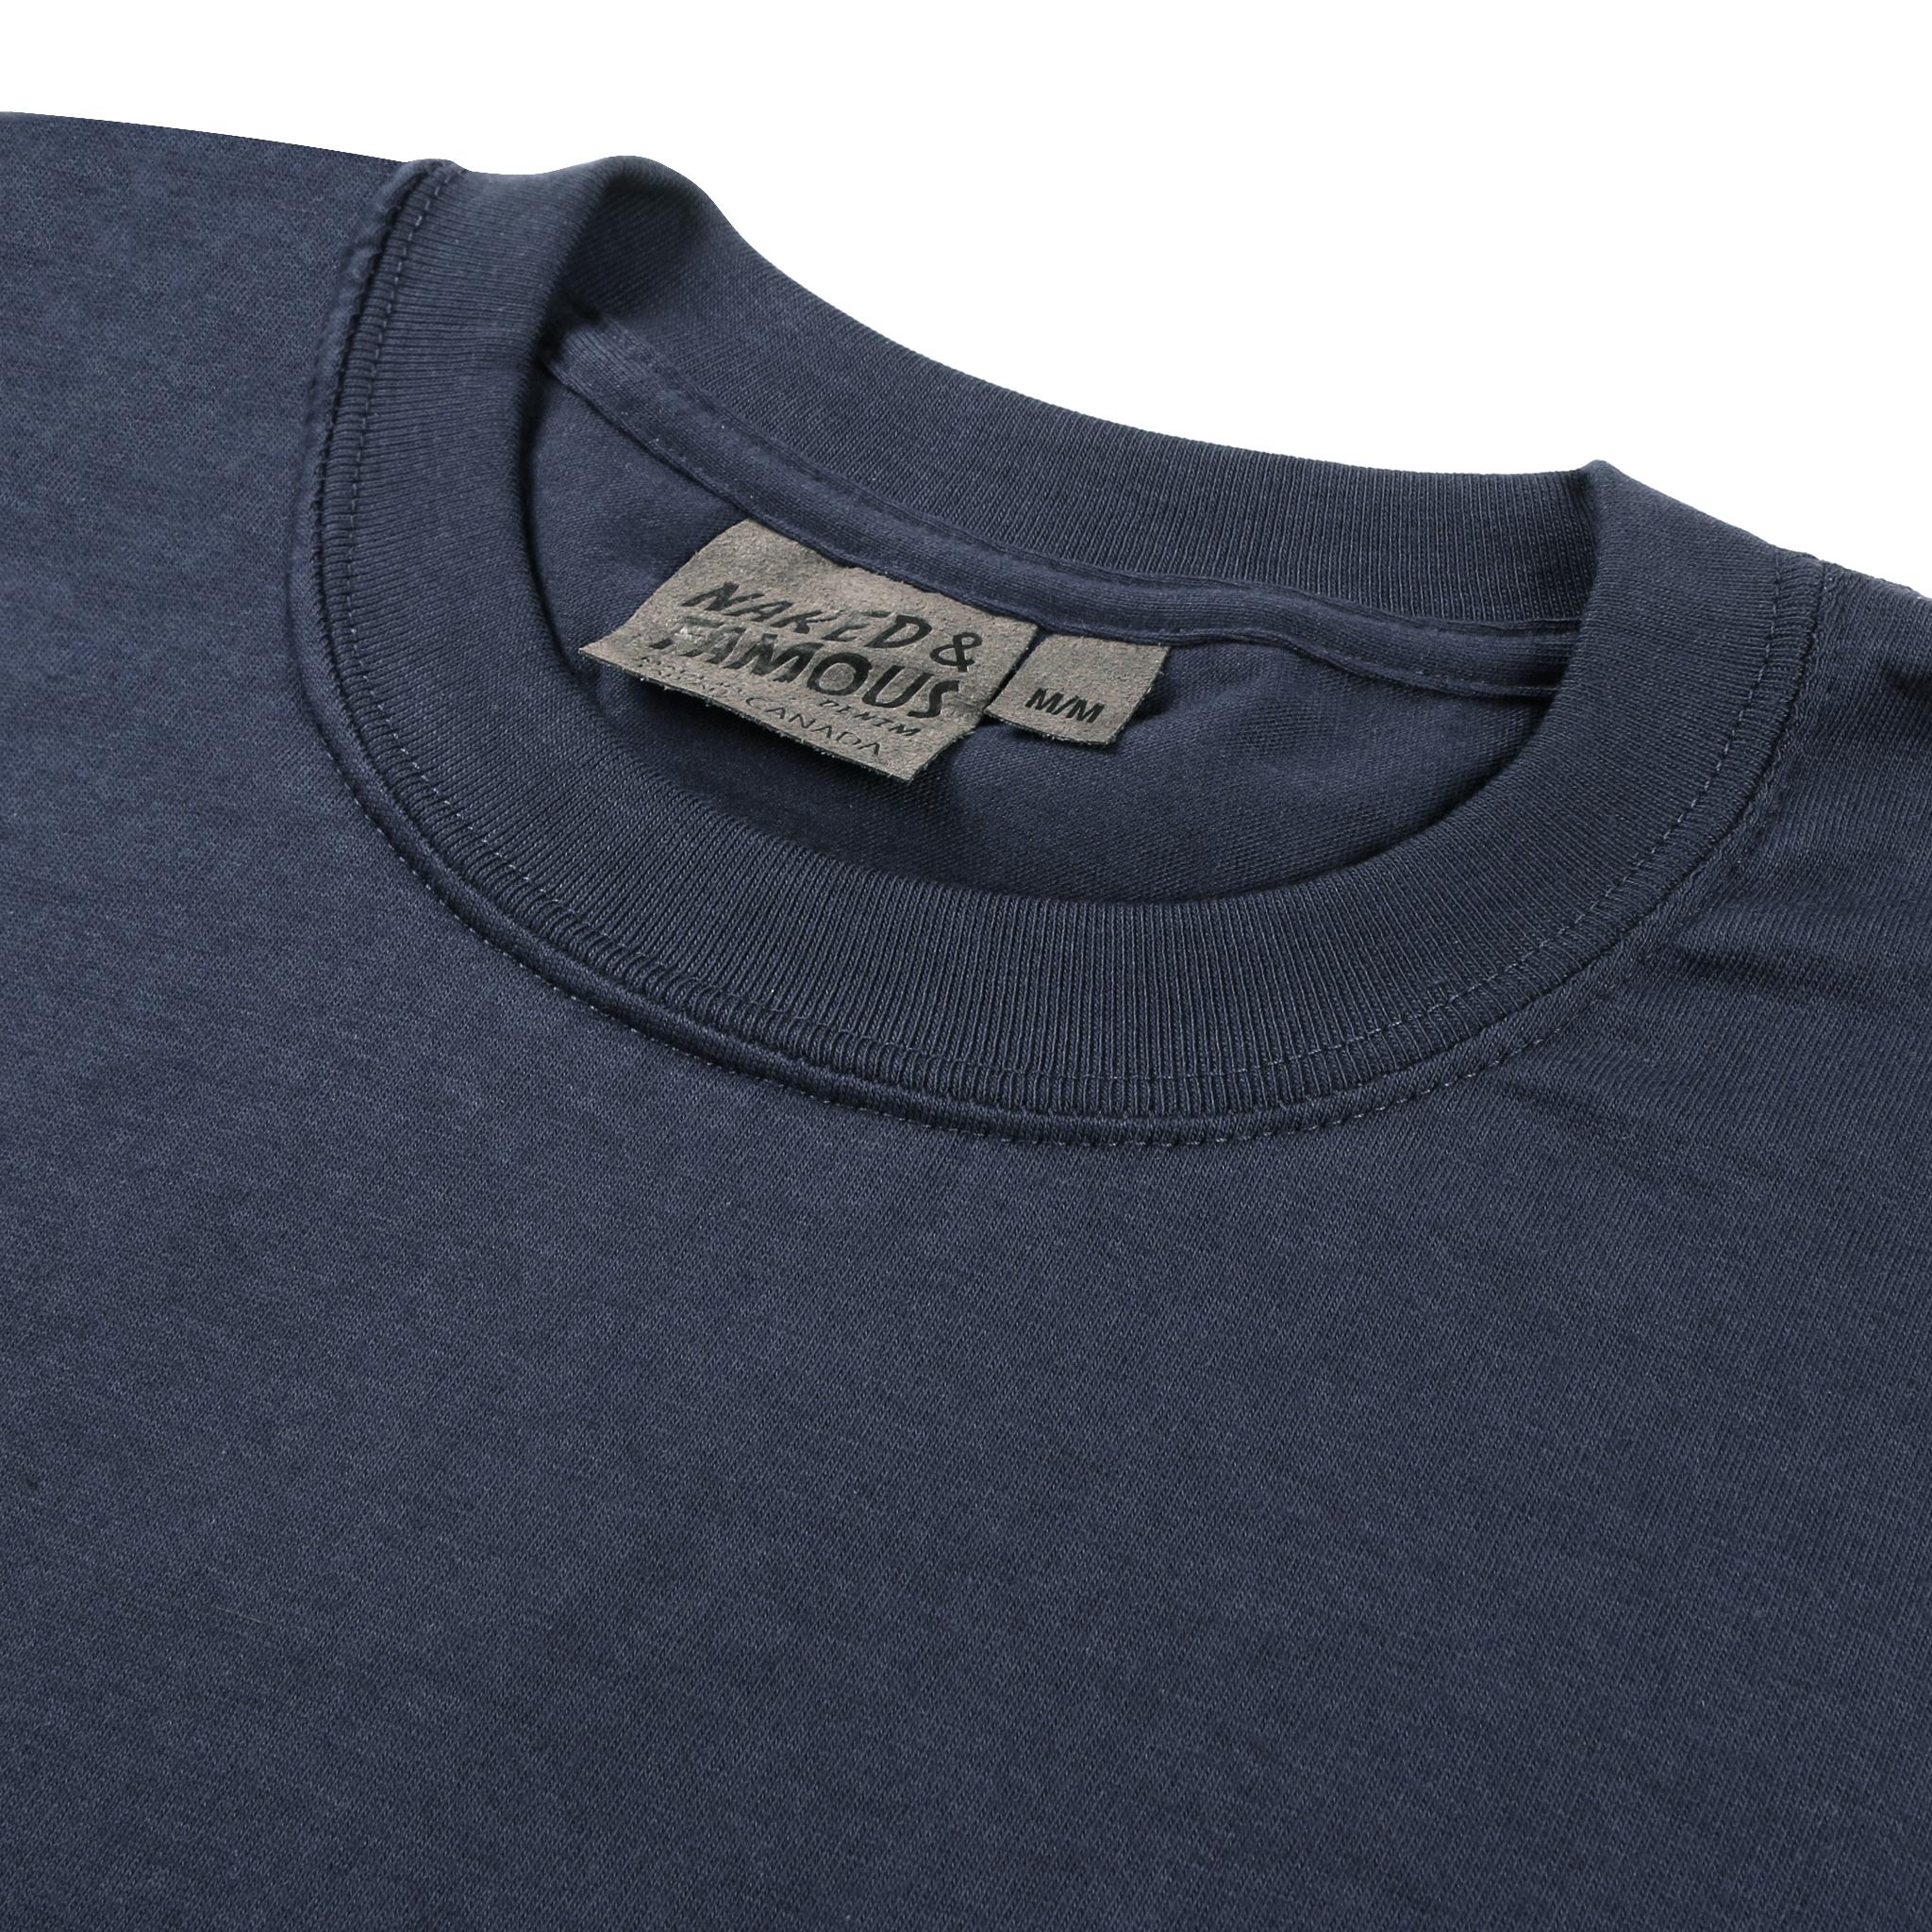 Navy Circular Knit T-Shirt Collar View